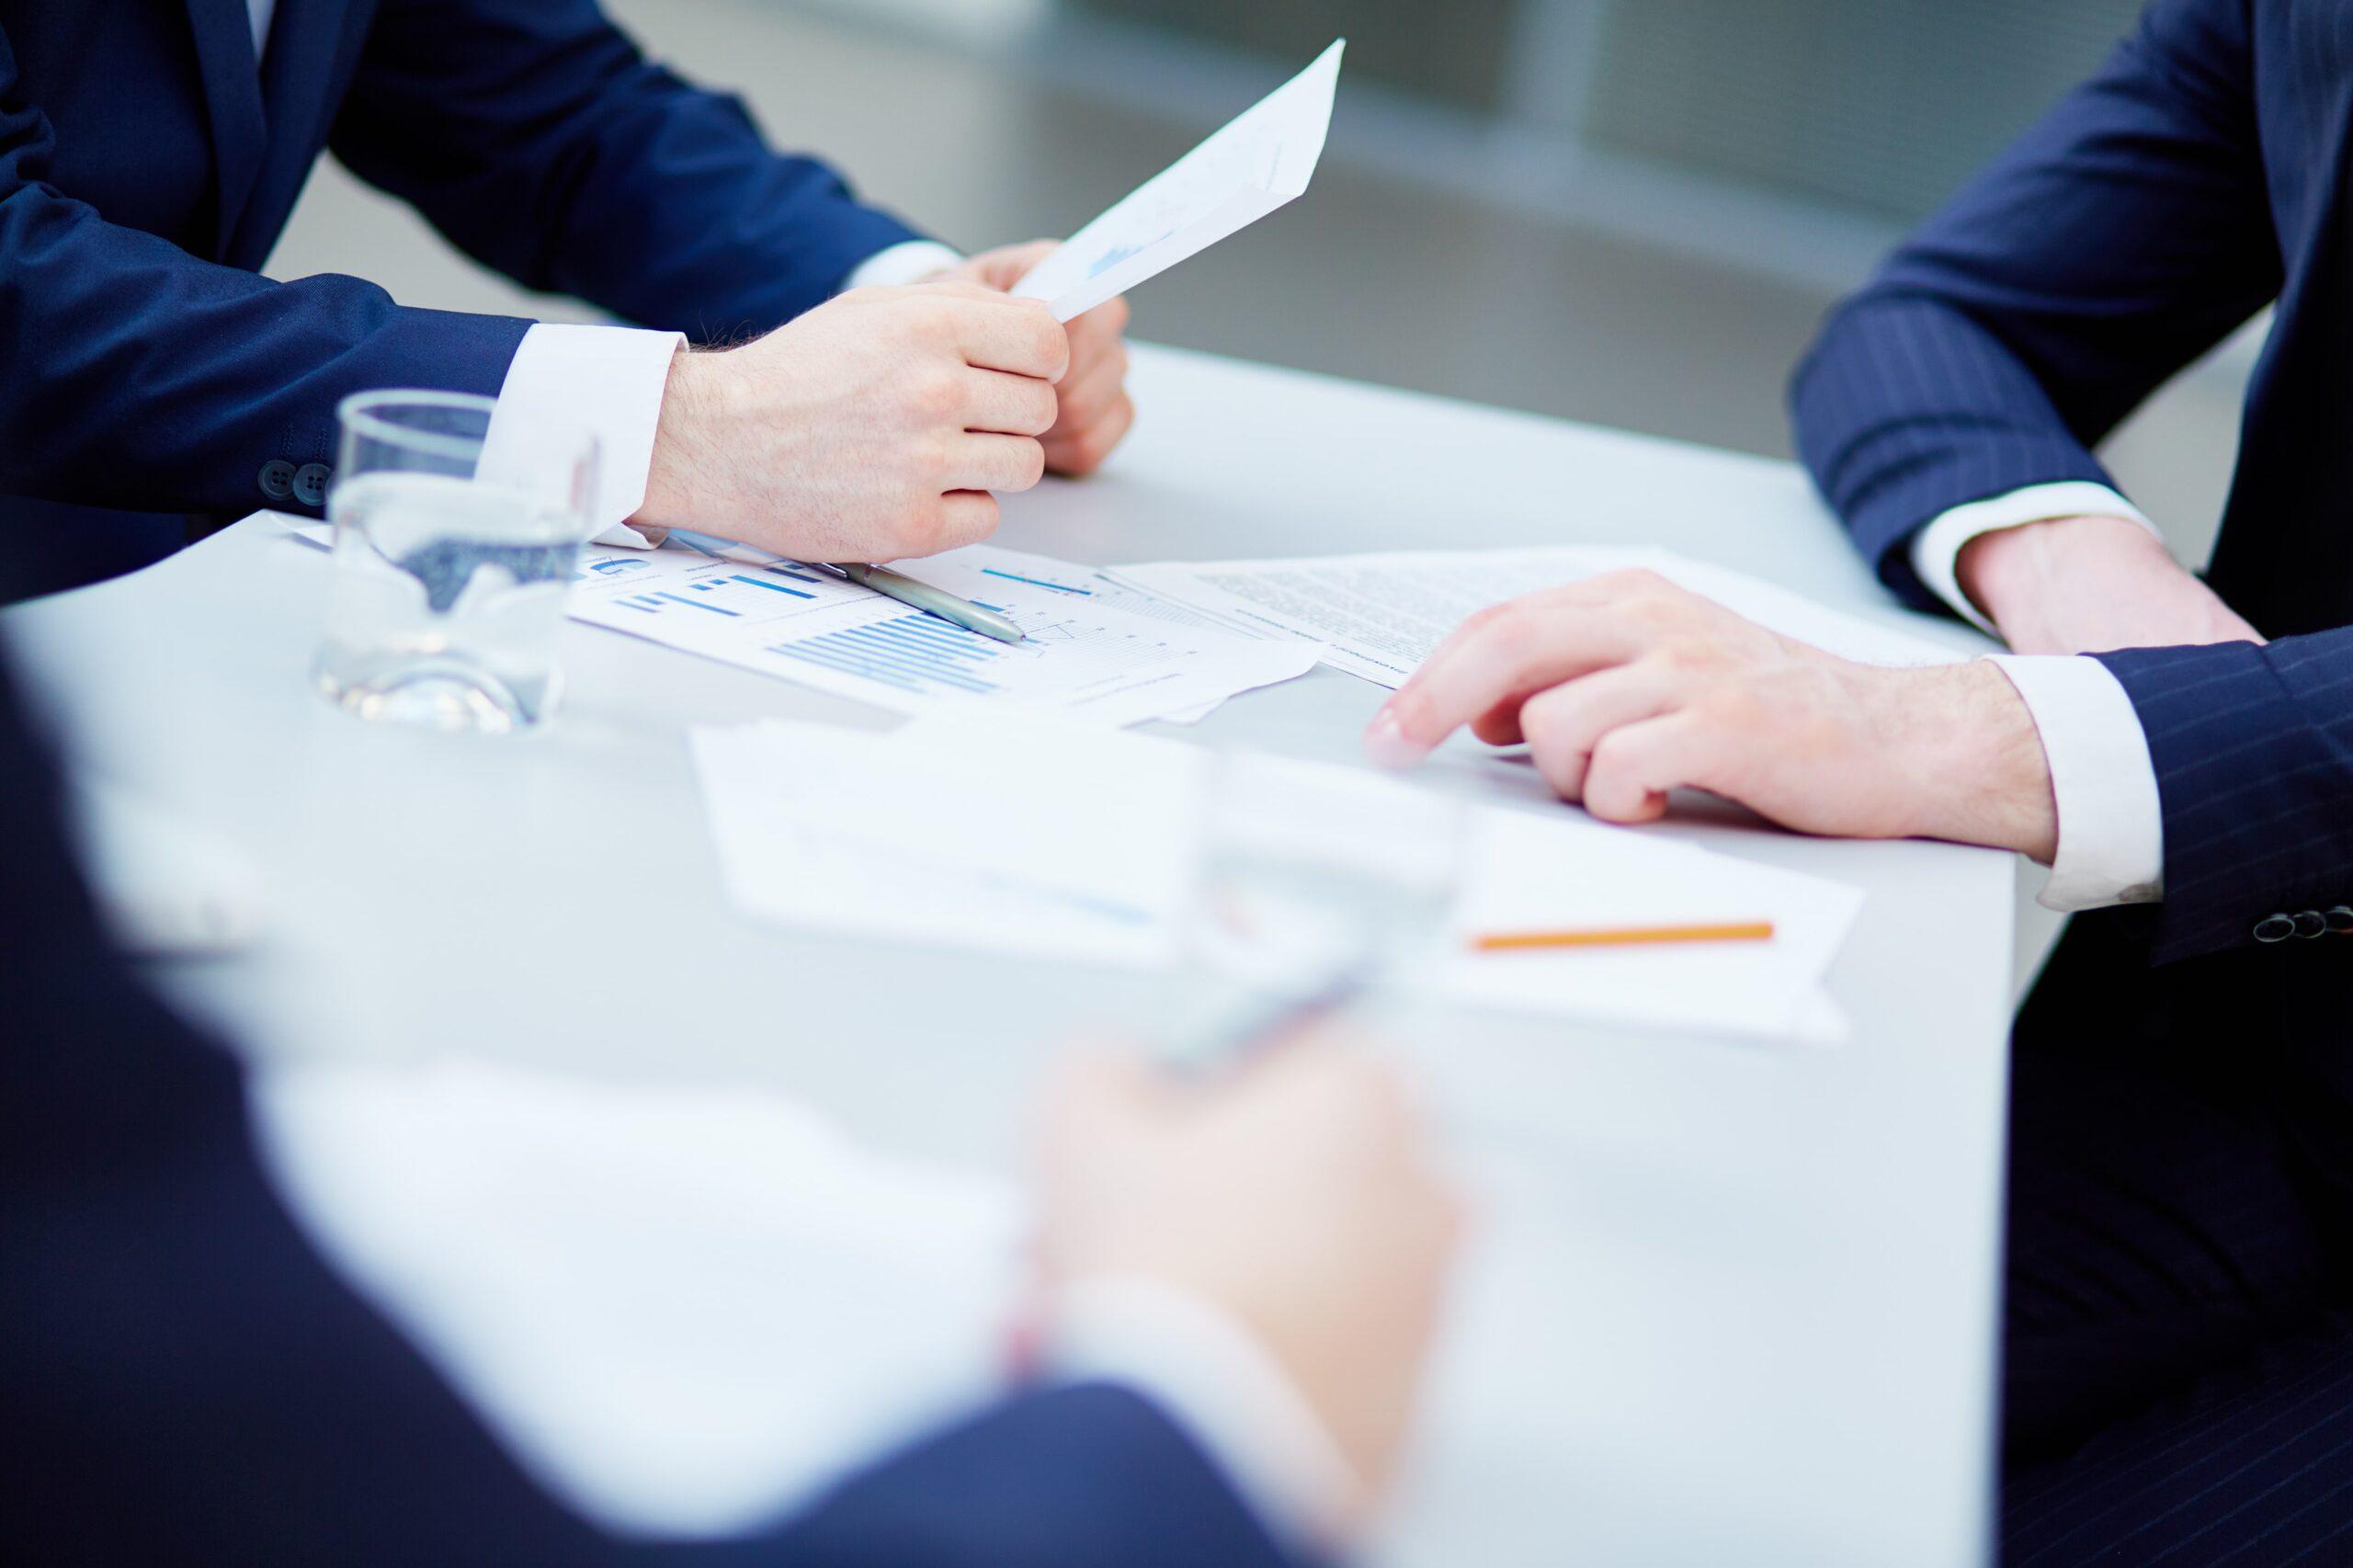 paperwork-PTG53AS-min